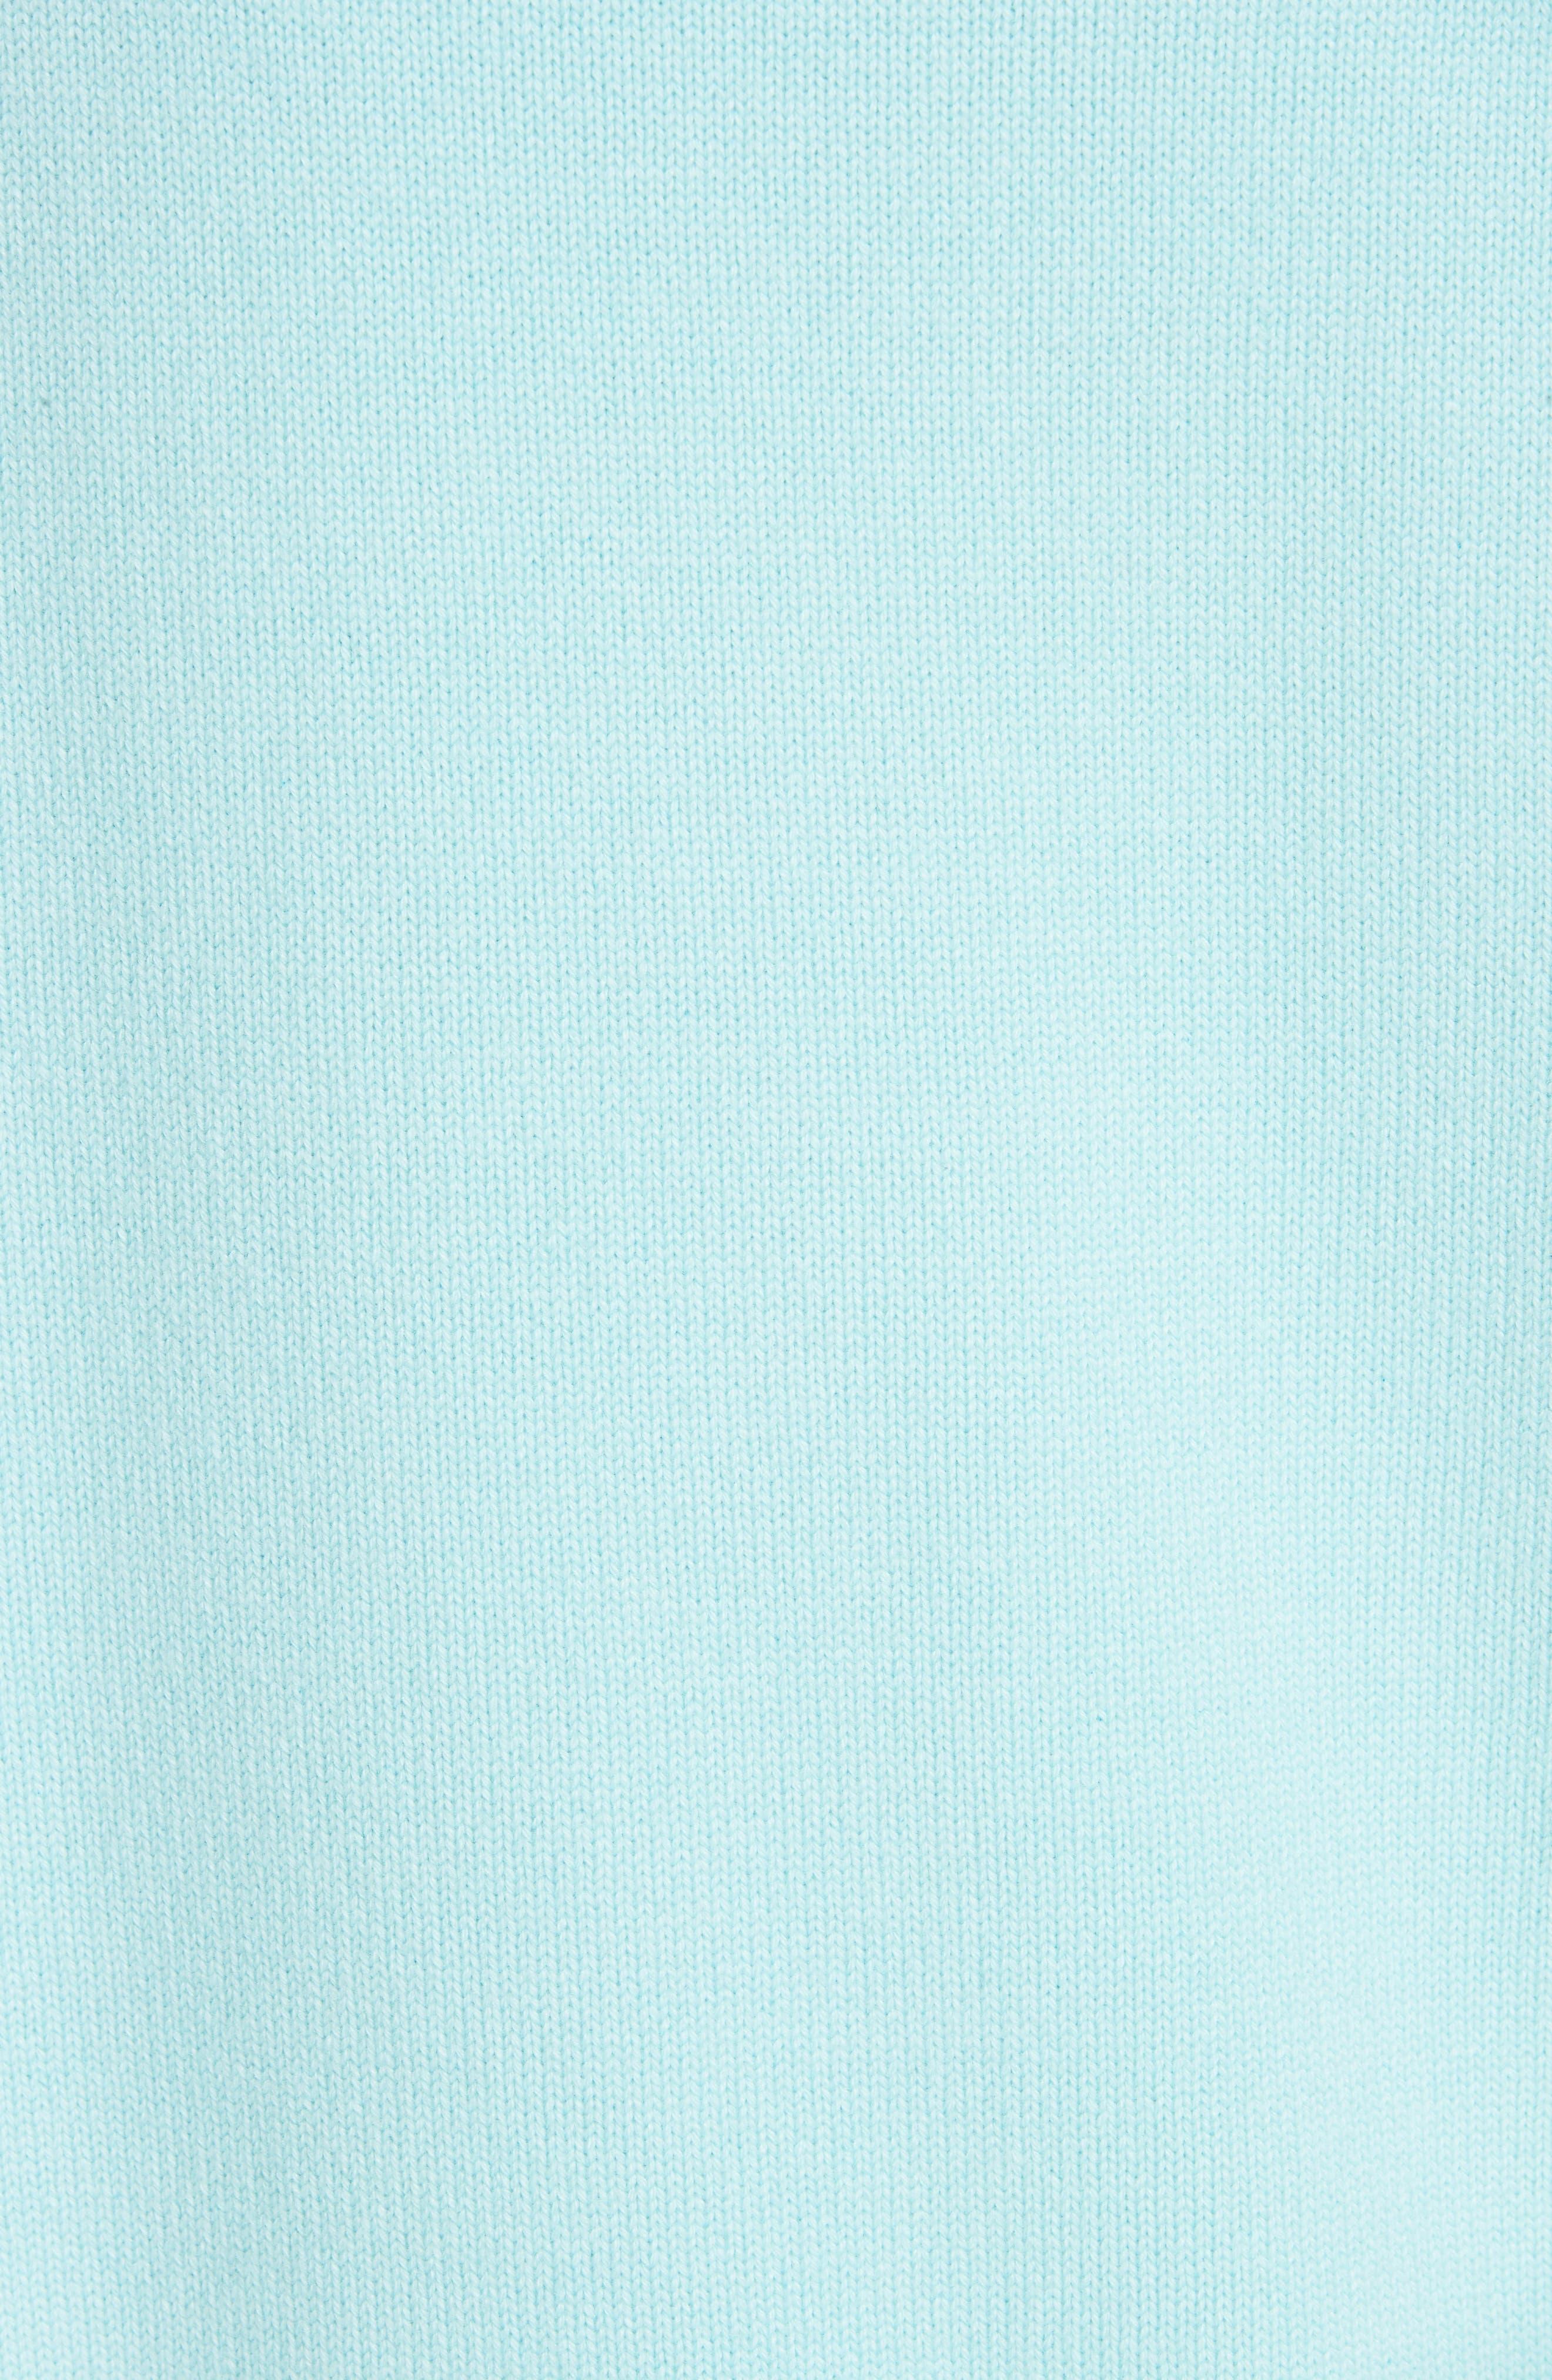 CALVIN KLEIN 205W39NYC, Logo Cashmere Sweater, Alternate thumbnail 6, color, SKY BLUE